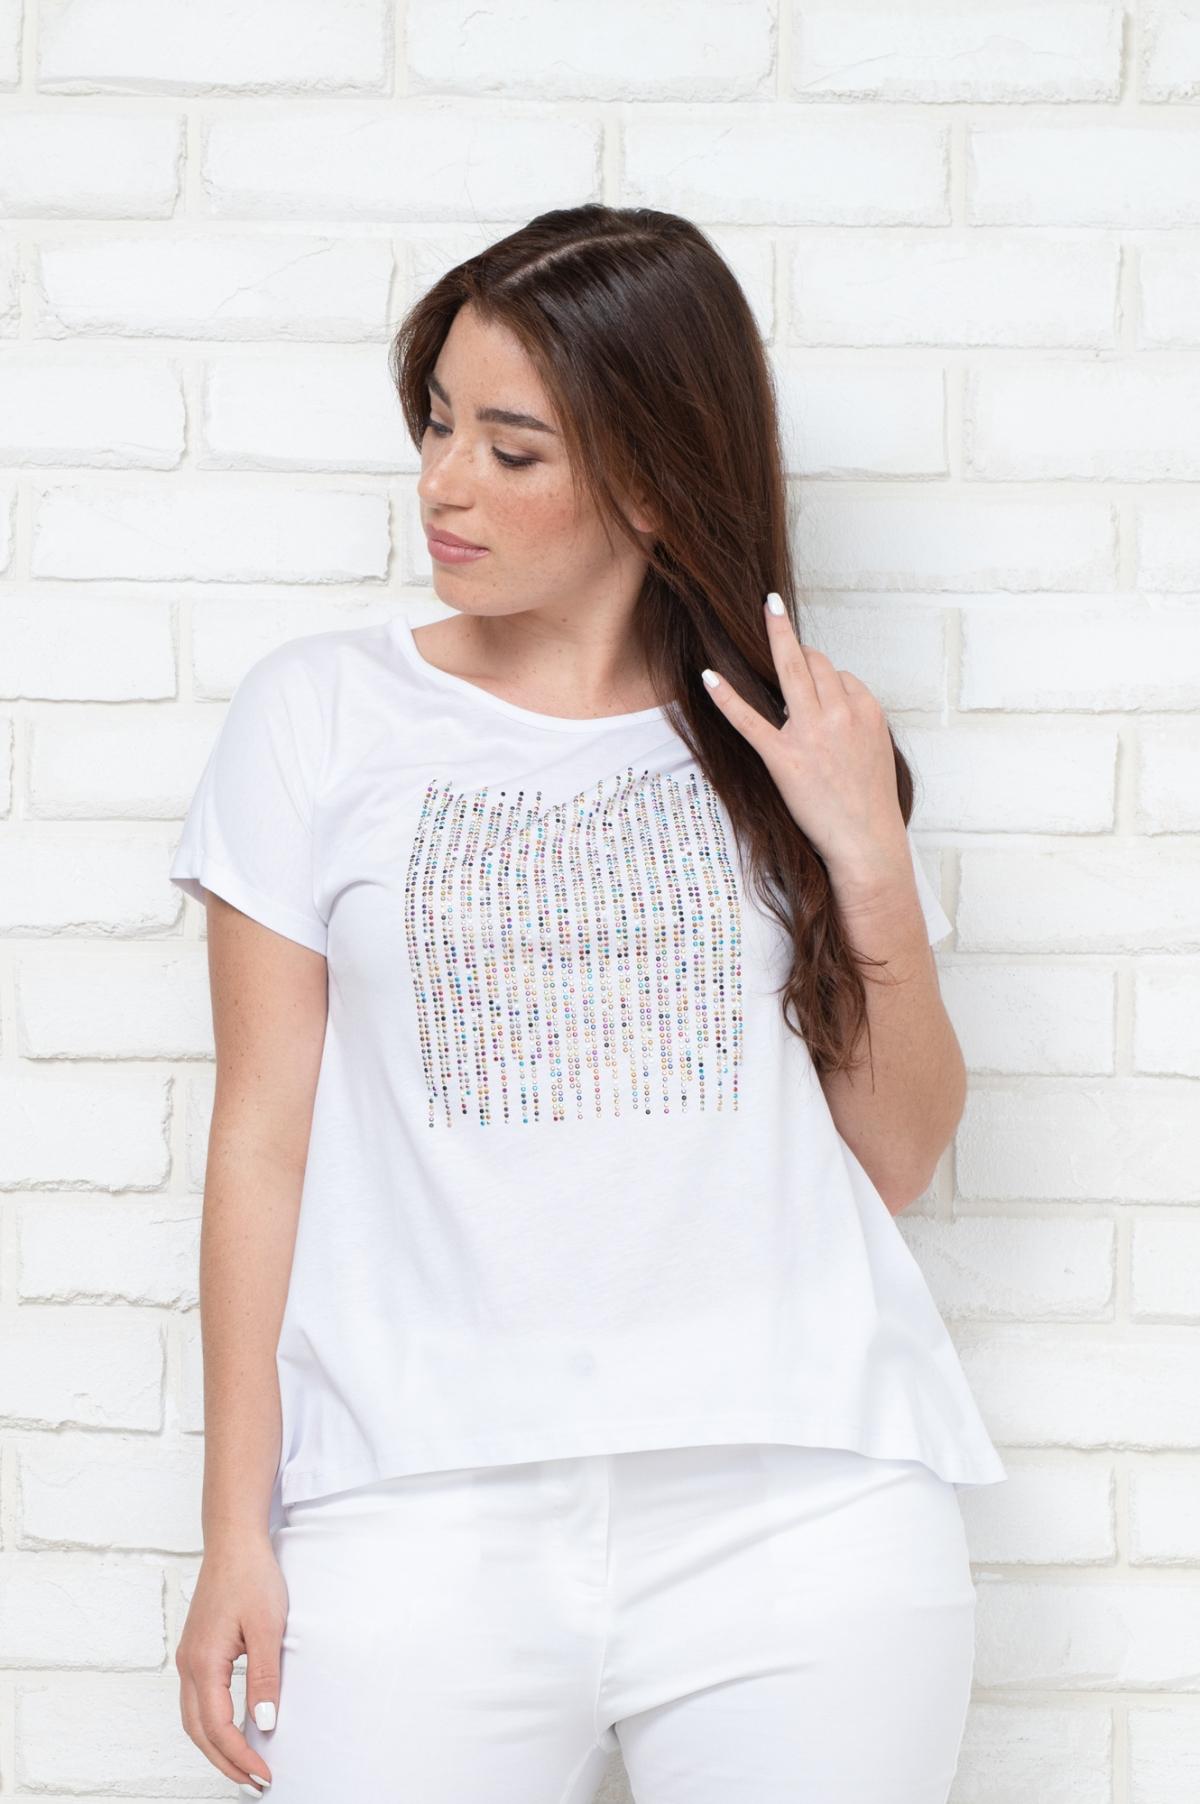 f4d6fb33d1 ΜΠΛΟΥΖΑ ΜΕ ΣΤΡΑΣΣ - Real Lady - Shop Online